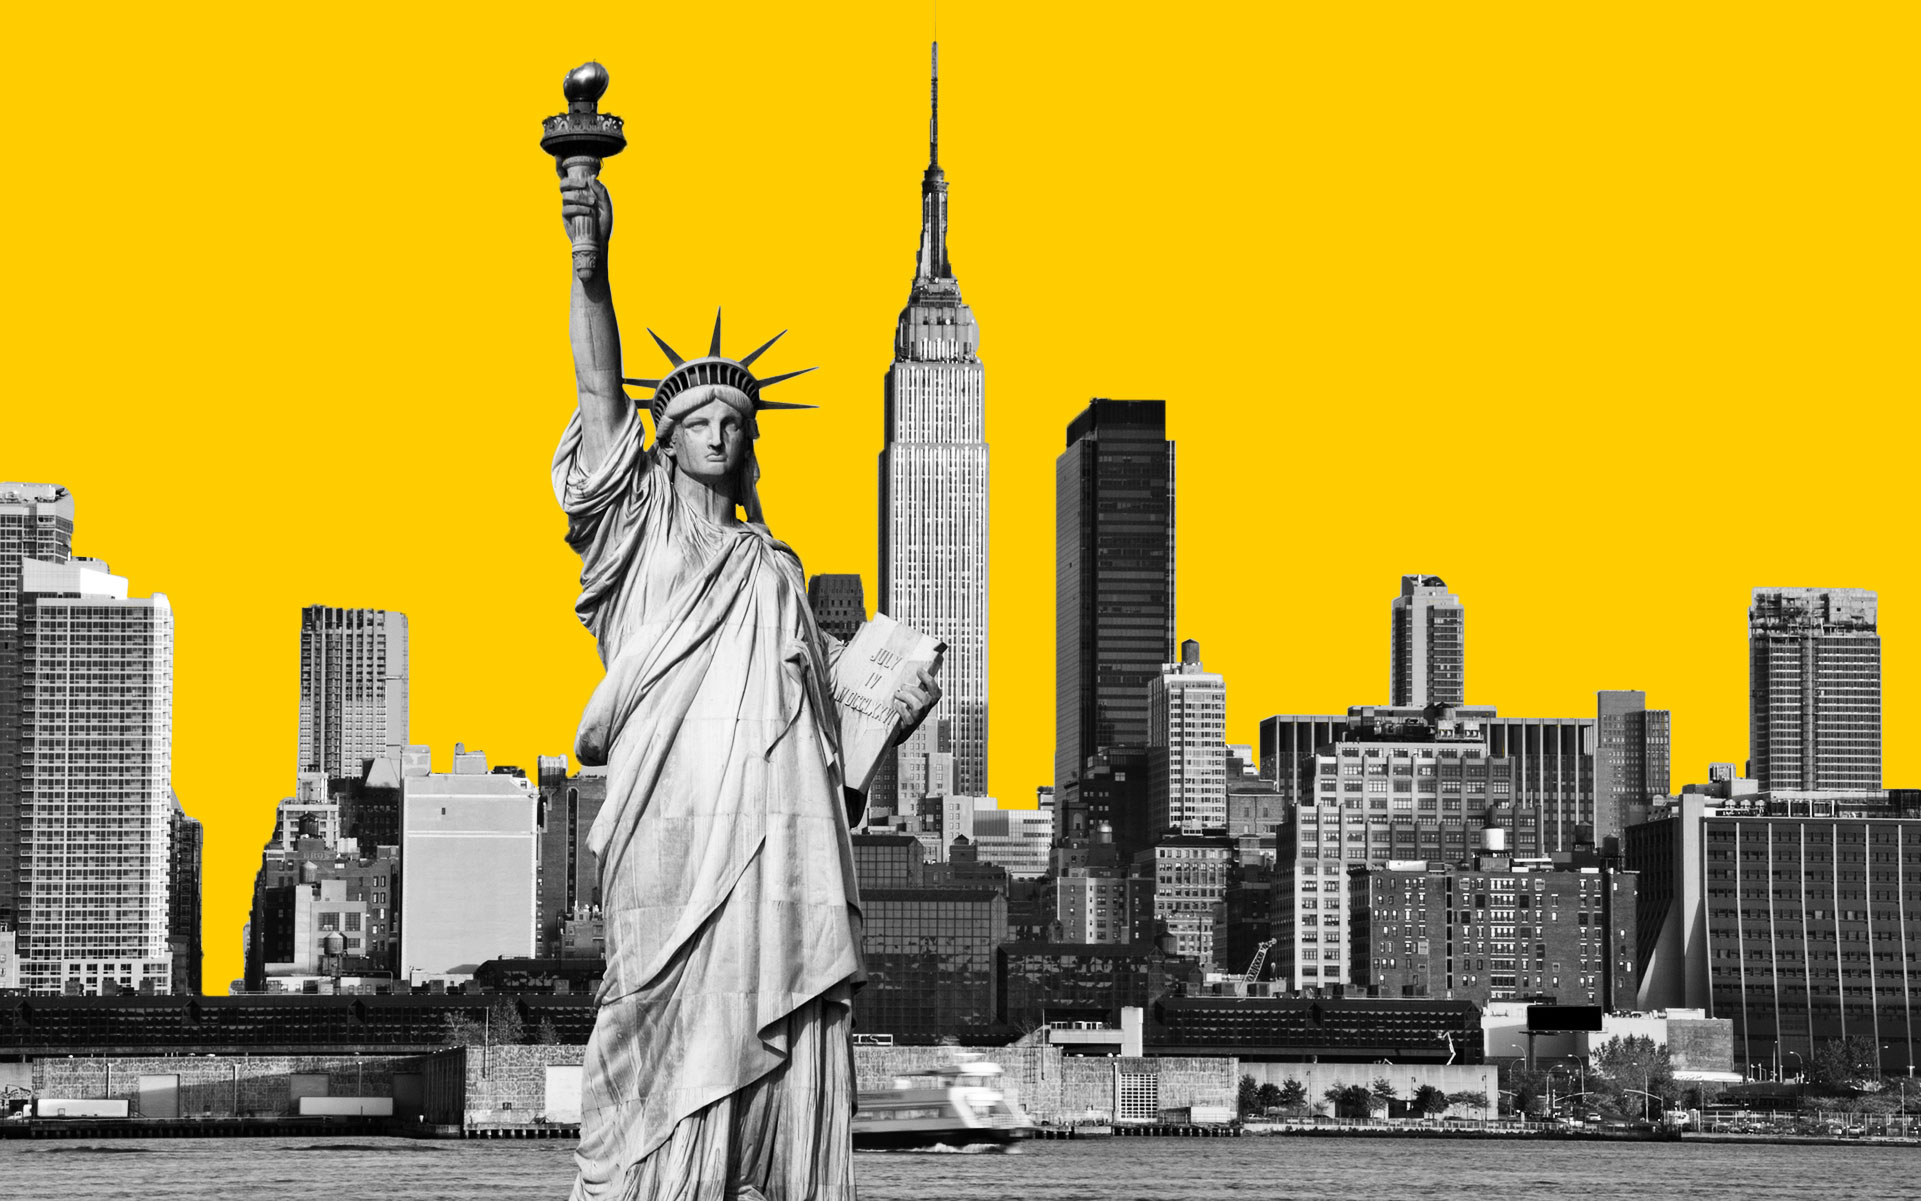 new york legalization of cannabis progress, andrew cuomo marijuana legalization in new york, cannabis in new york